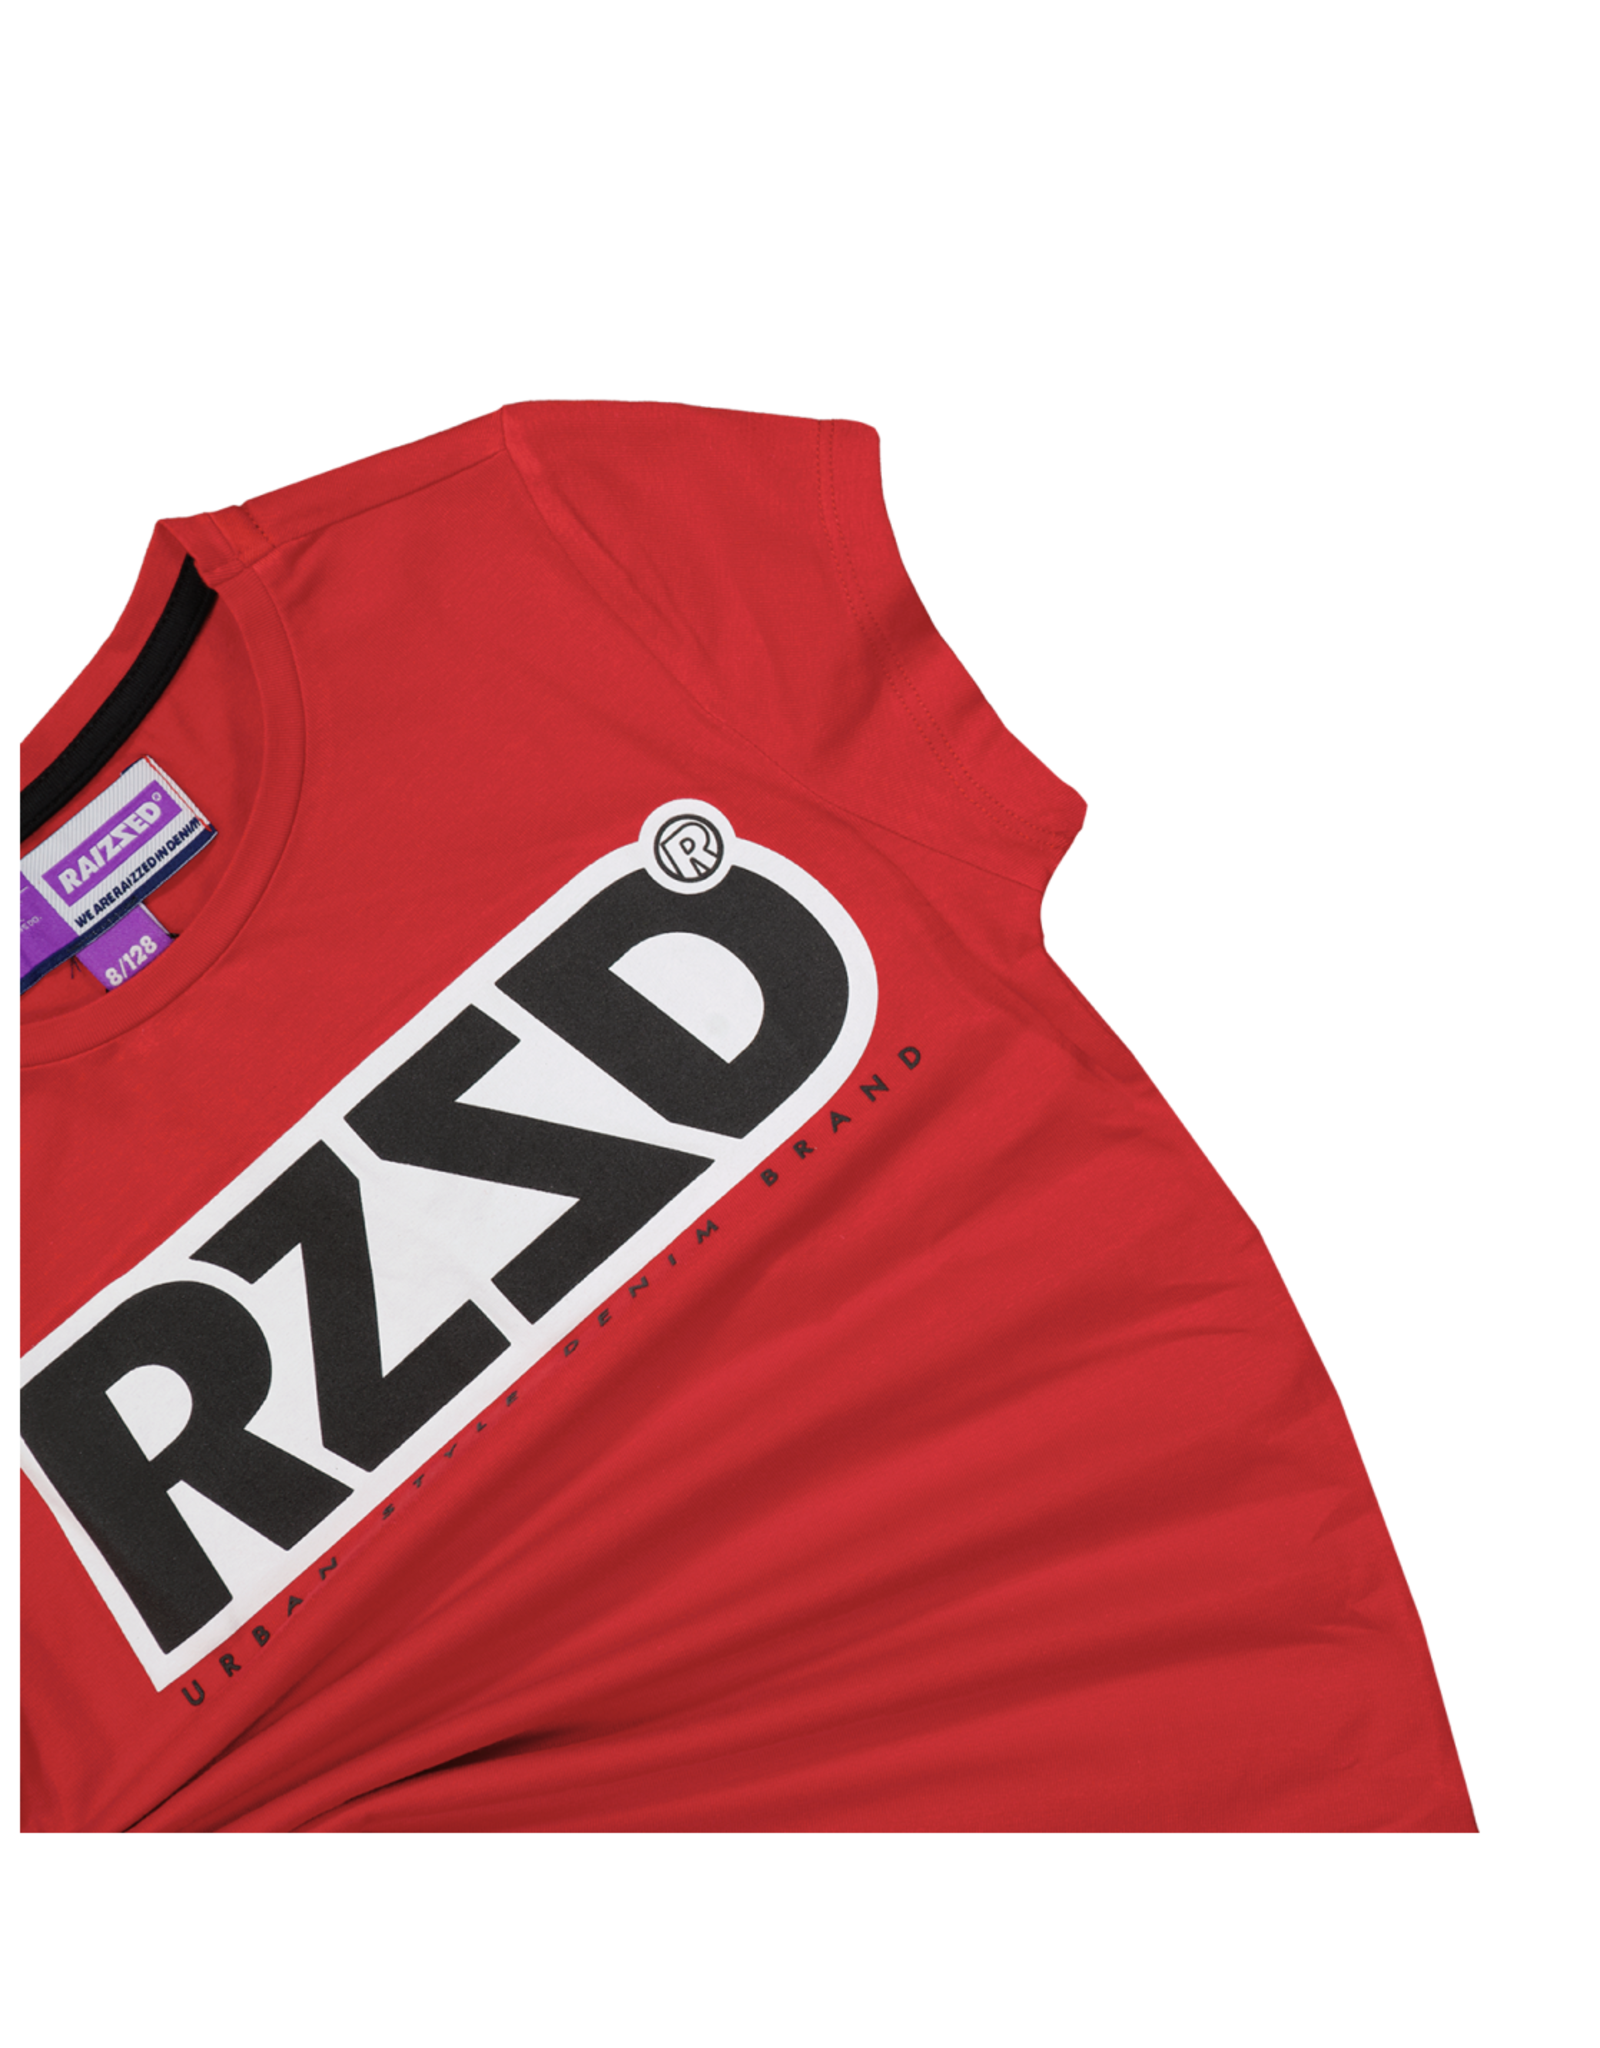 Raizzed Denpasar 607 Blast Red